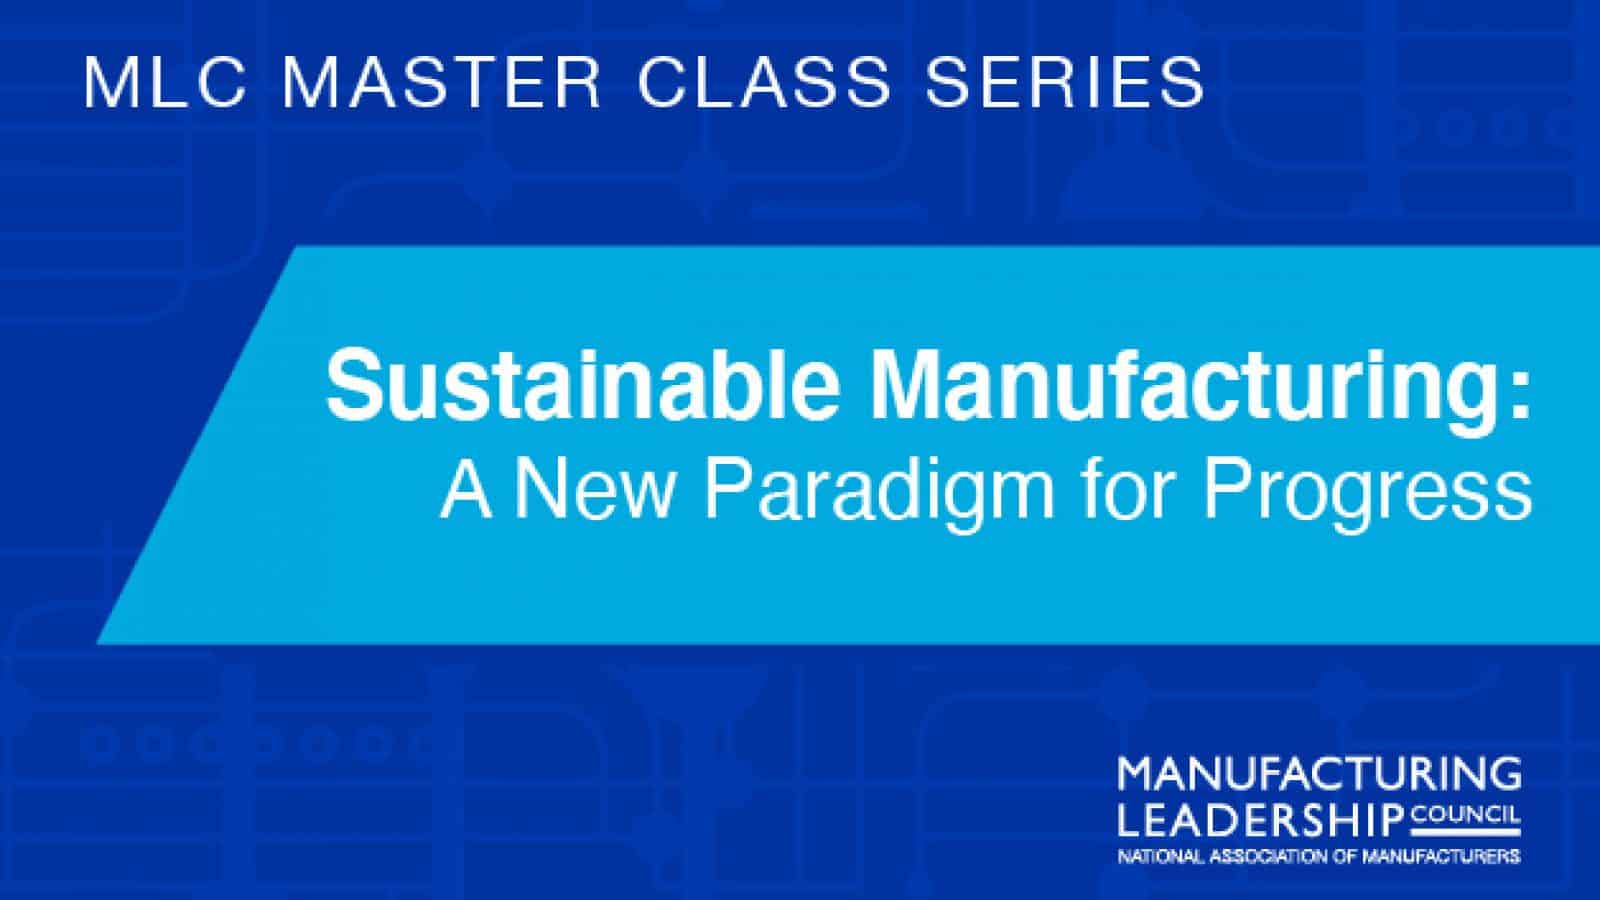 MLC Master Class Webinar - Feb. 17, 2021